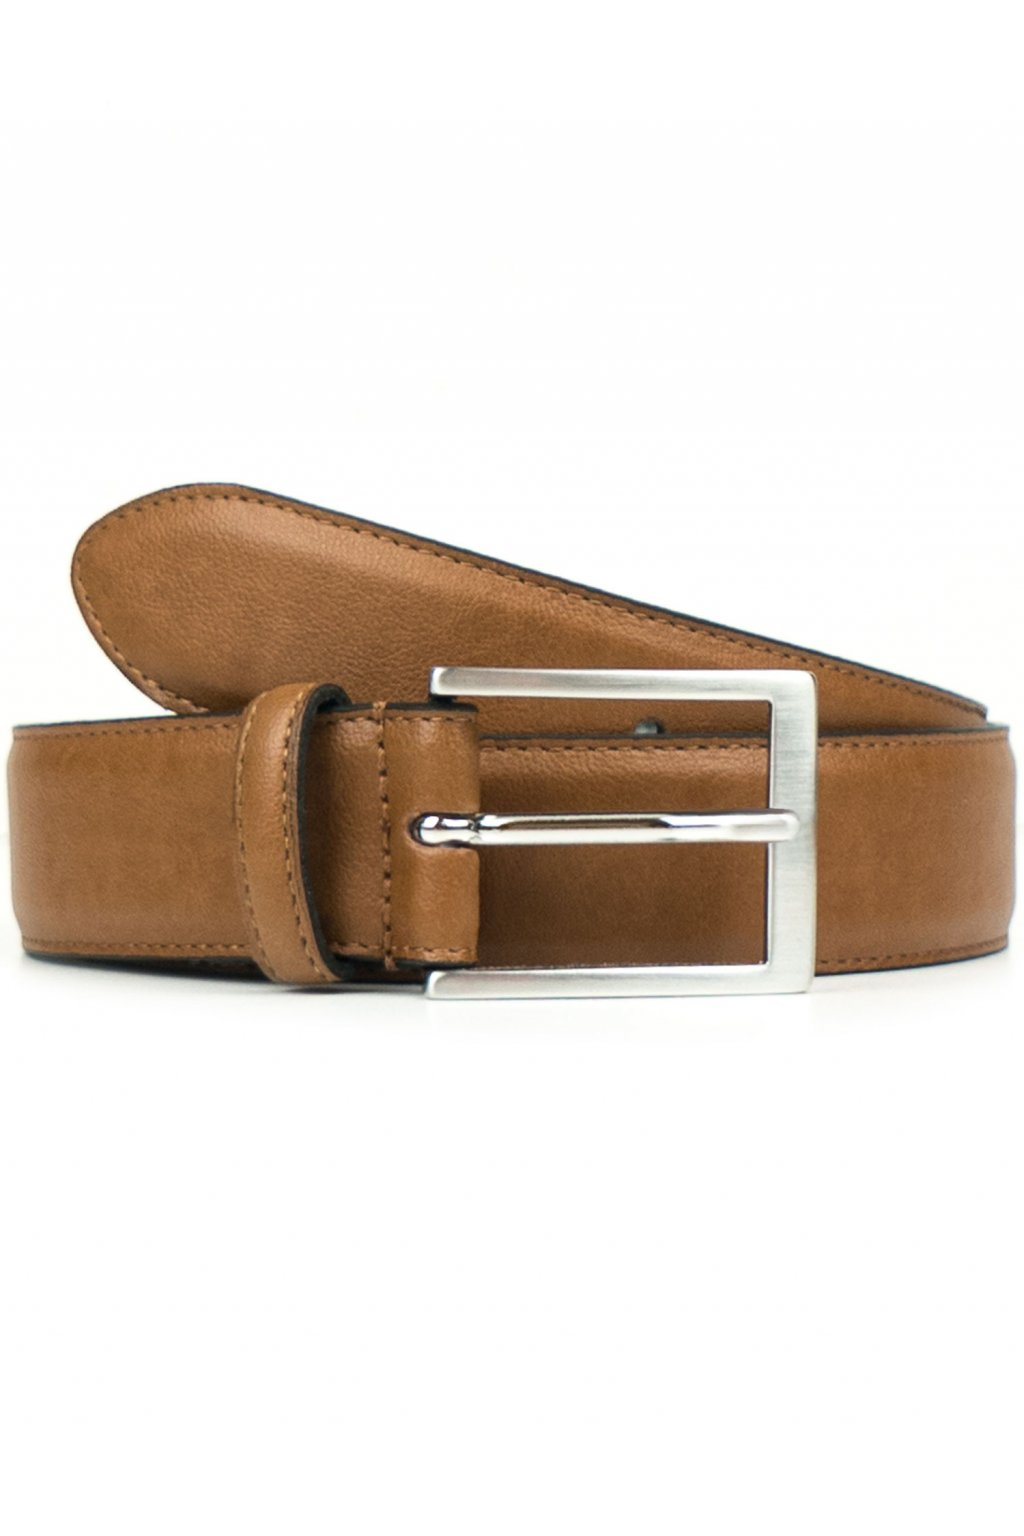 "Bledohnedý opasok ""Classic 3,5cm Belt Tan"""